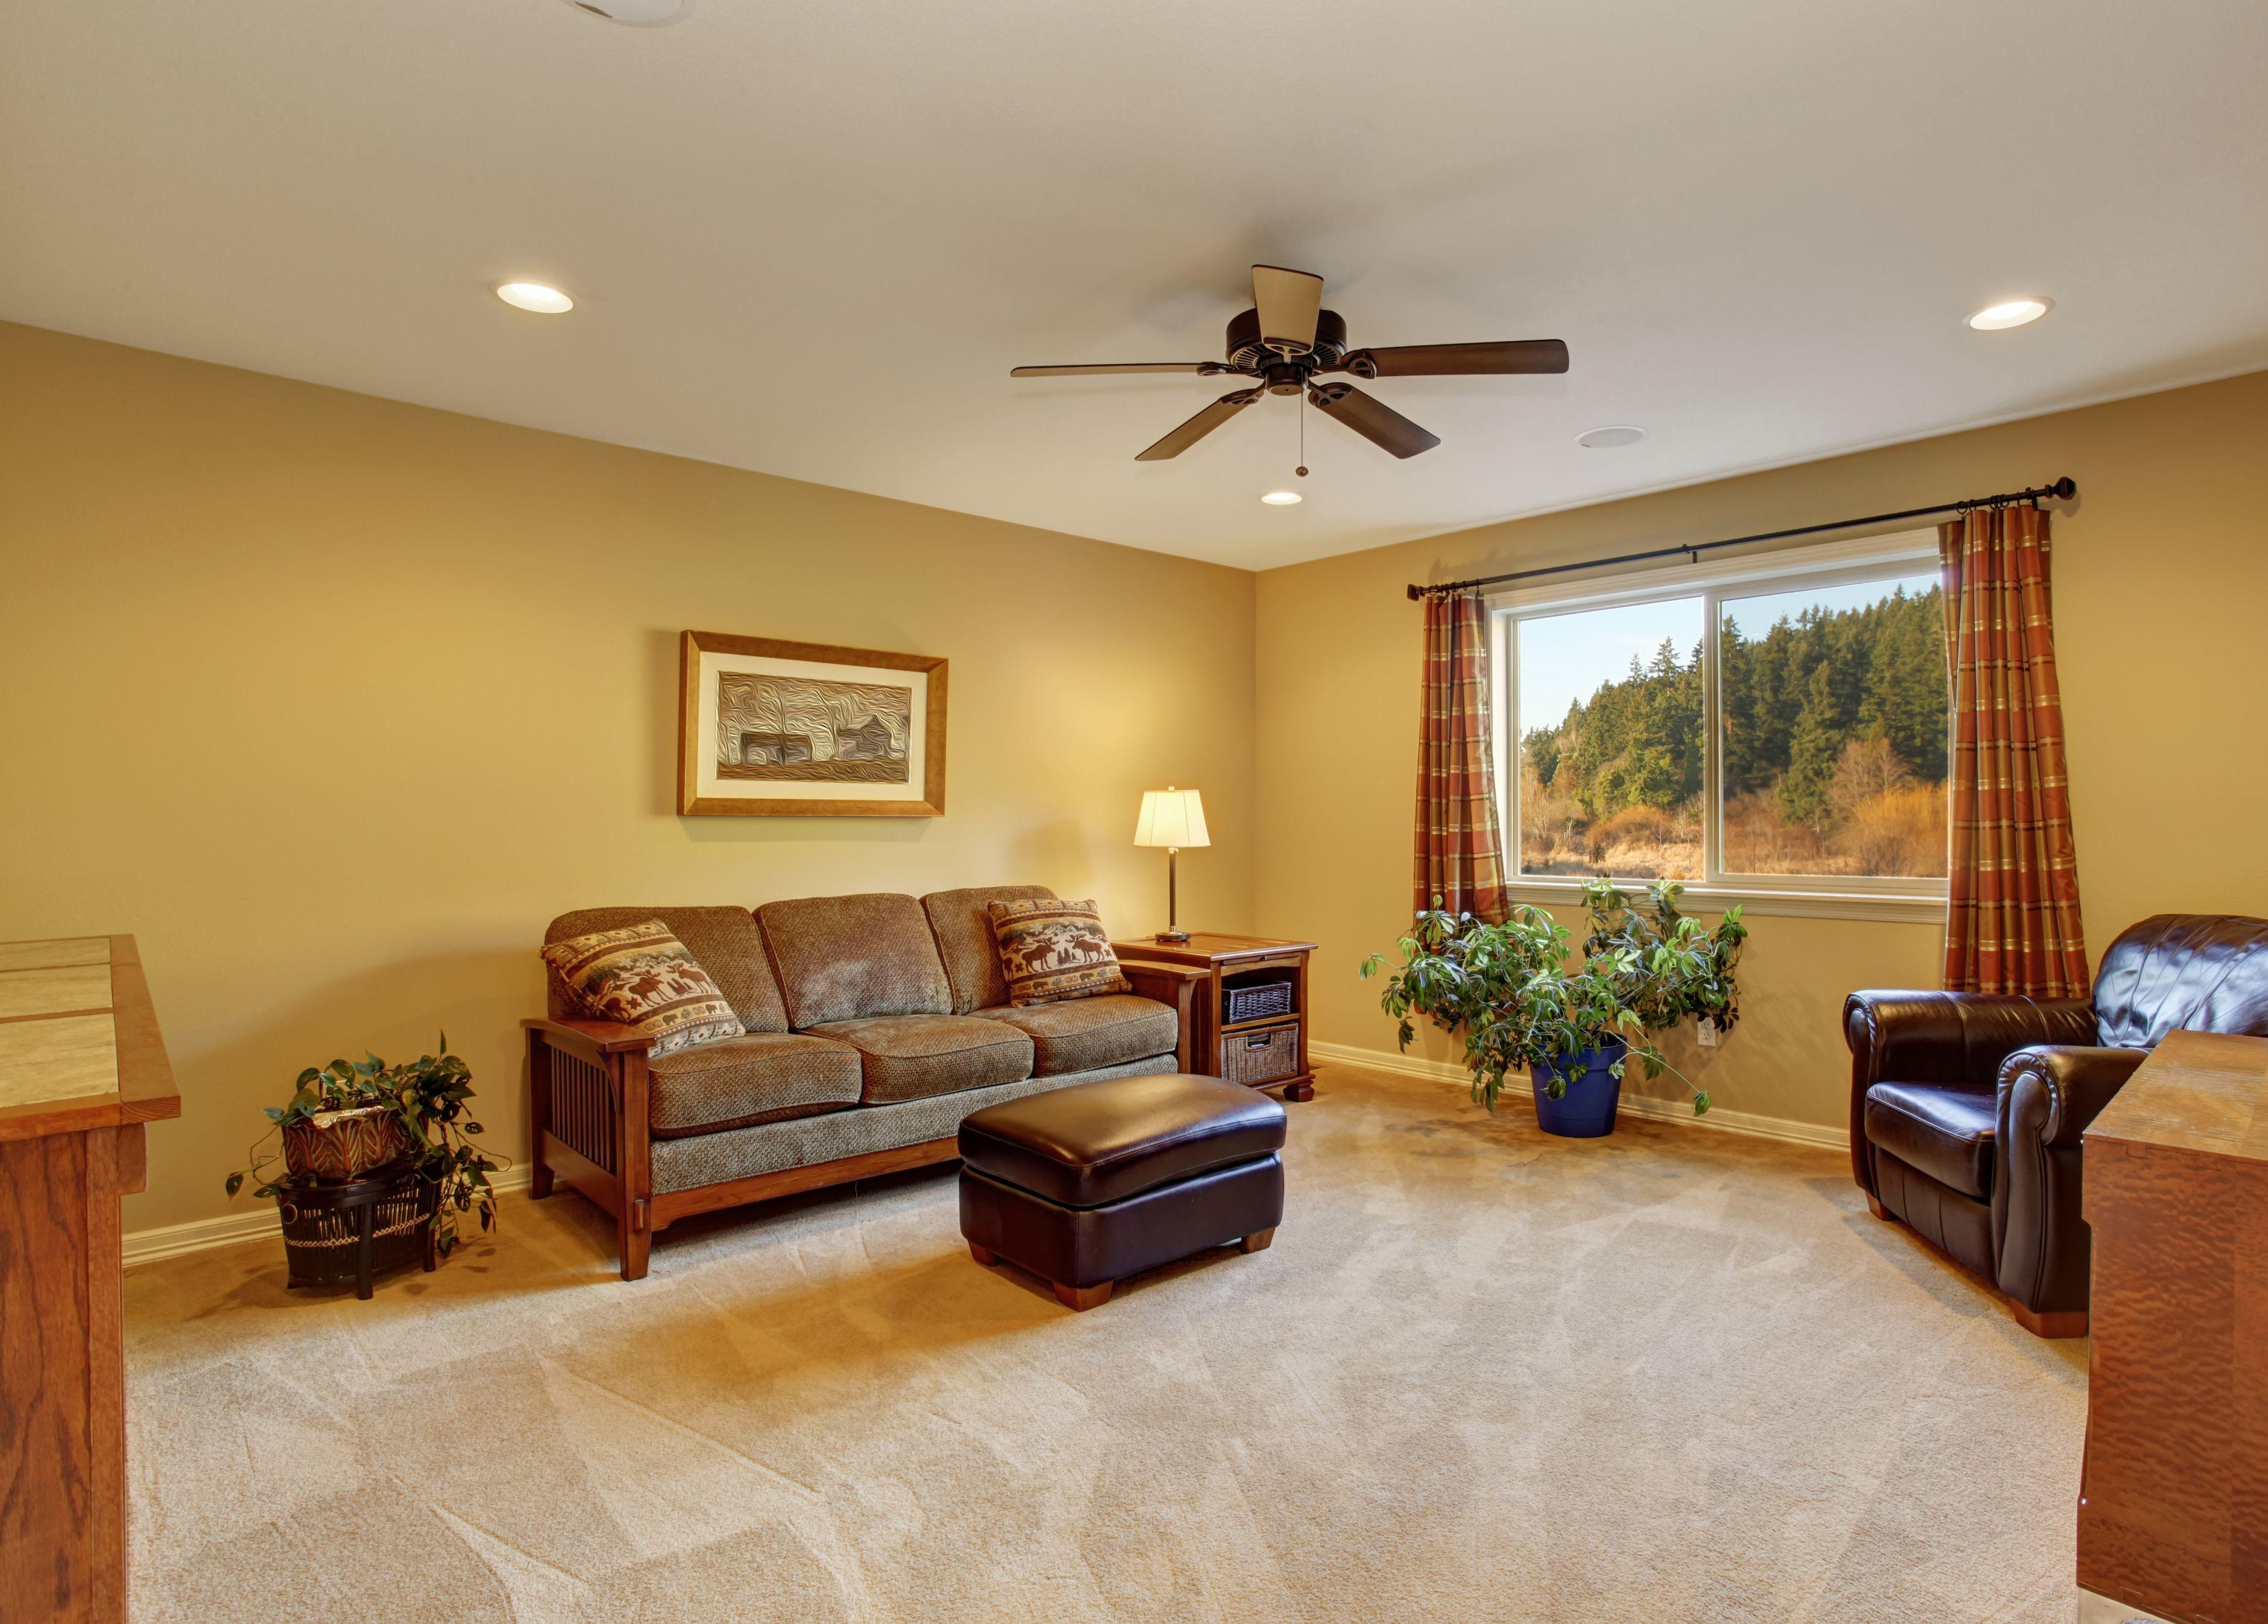 Cleaned Capet in Living Room - Carpet - Santa Maria, CA